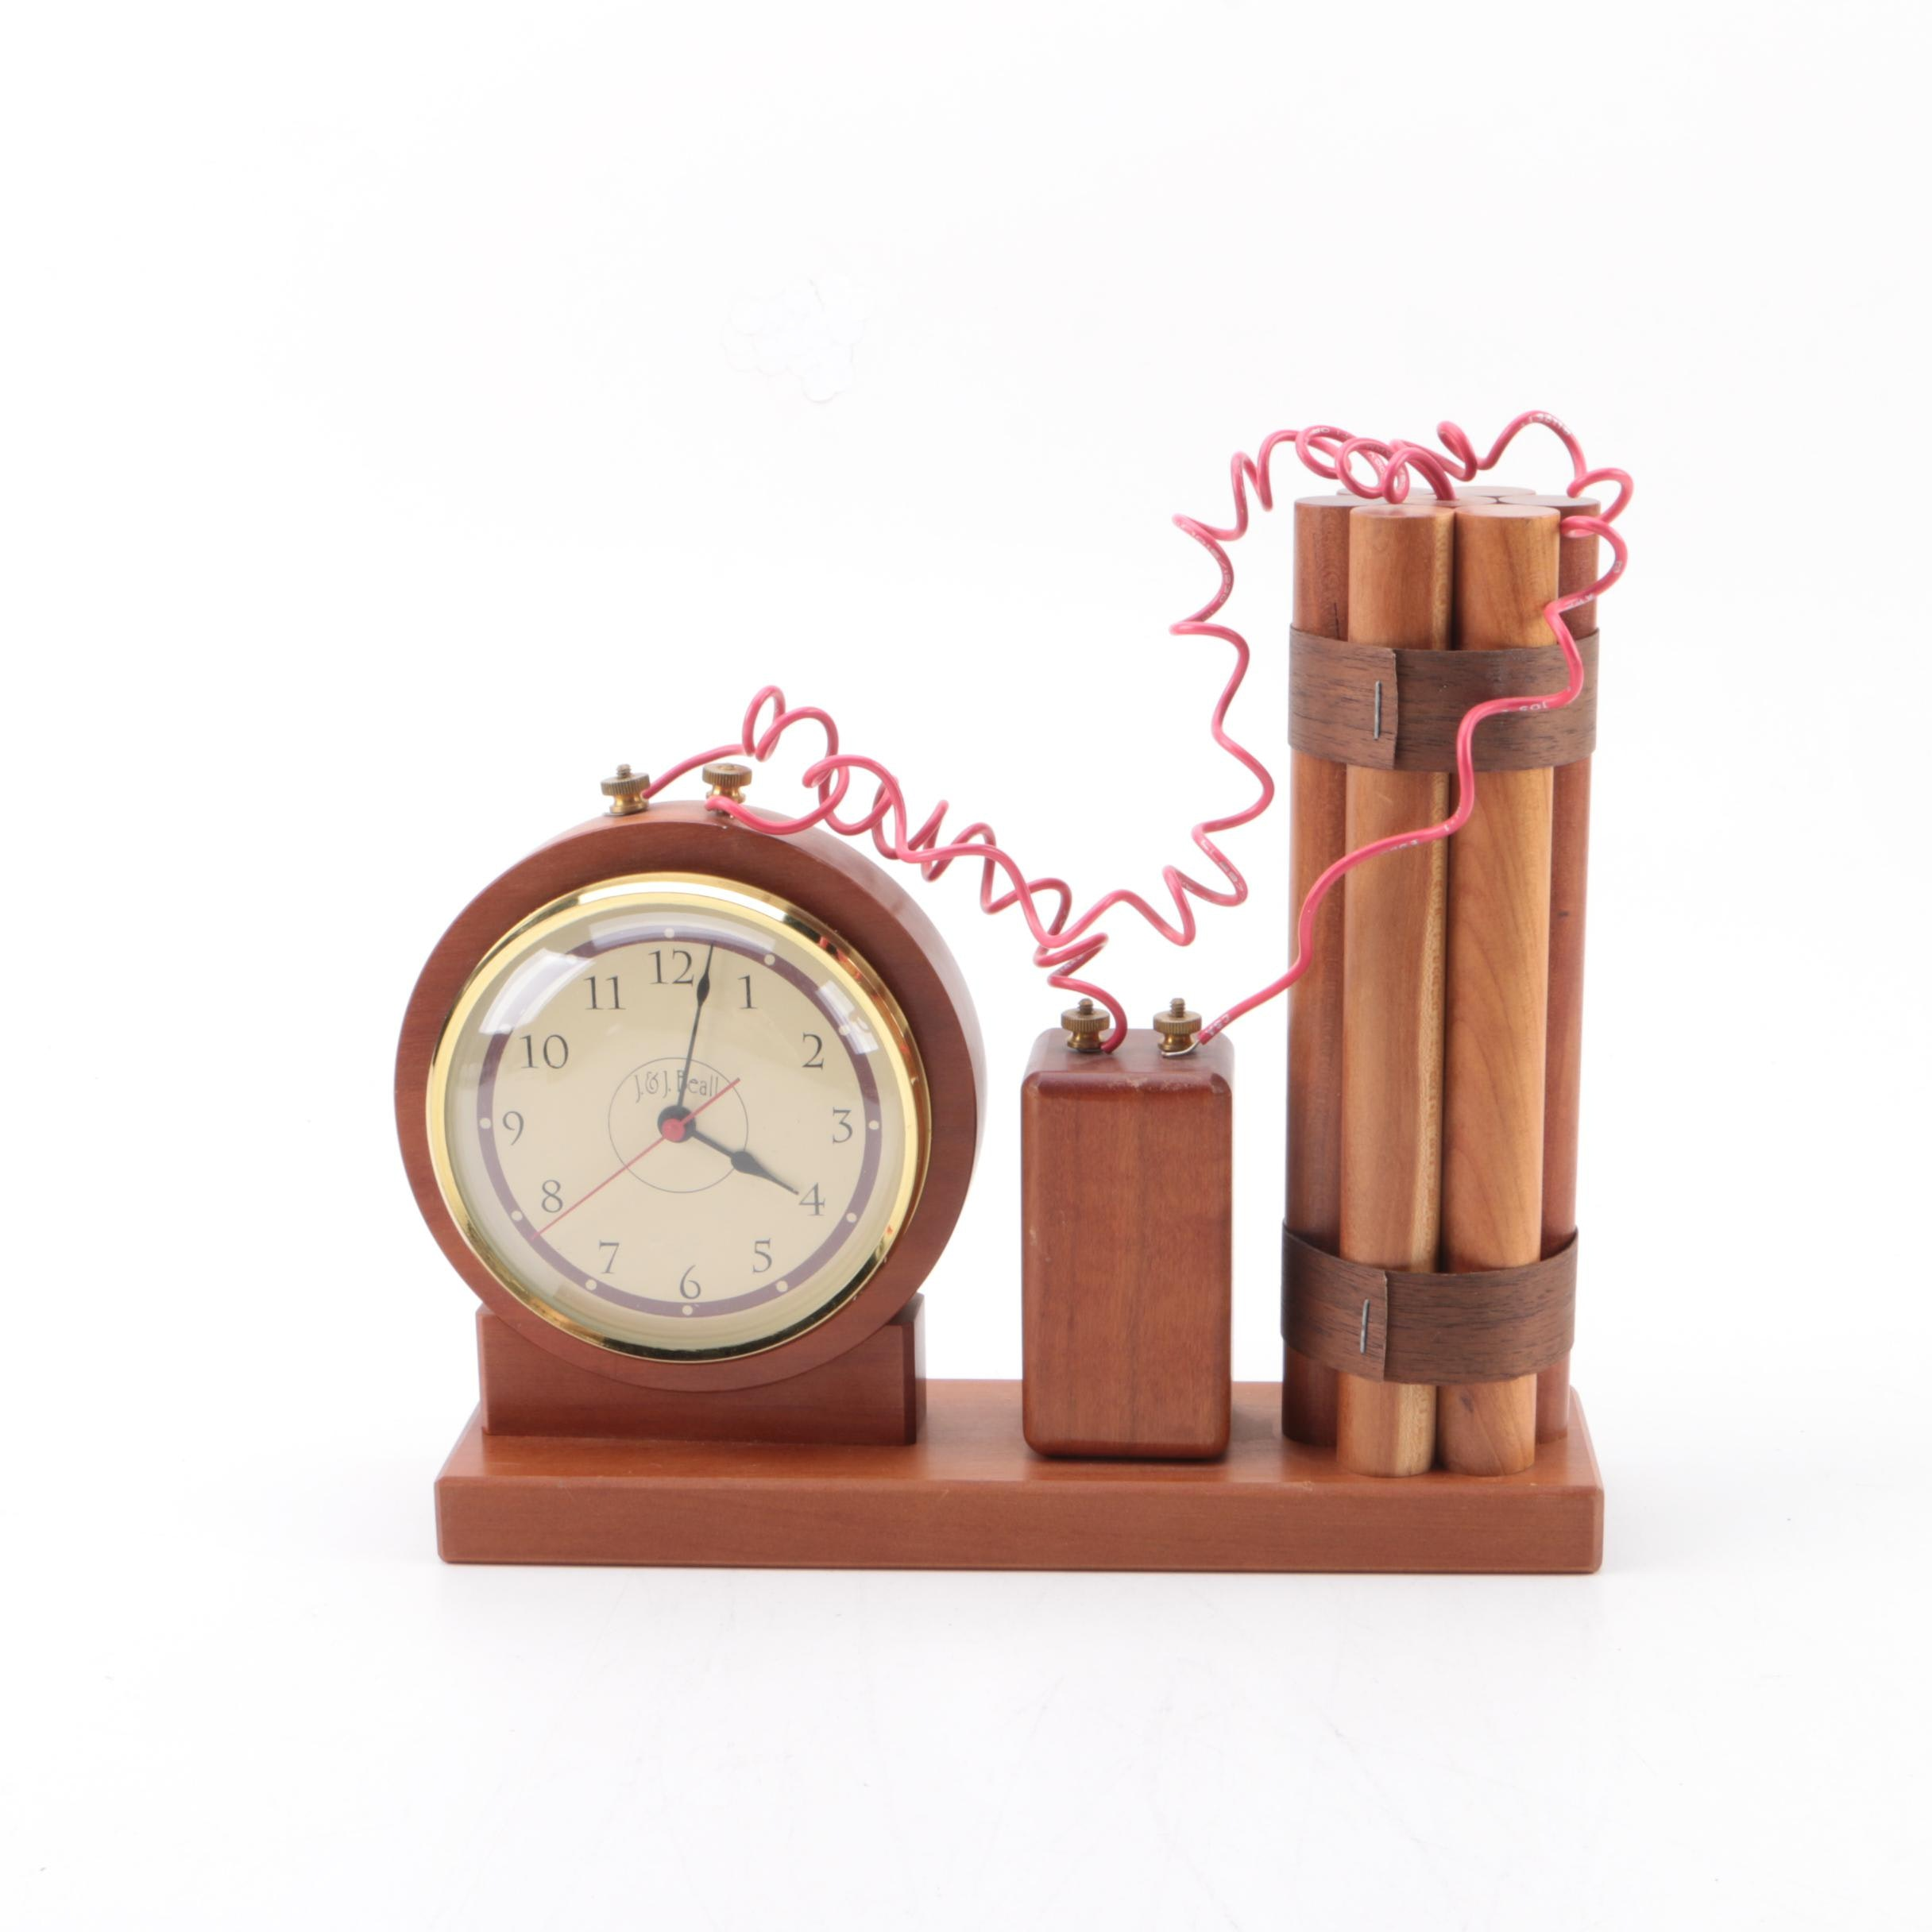 J. & J. Beall Novelty Dynamite Themed Mantel Clock